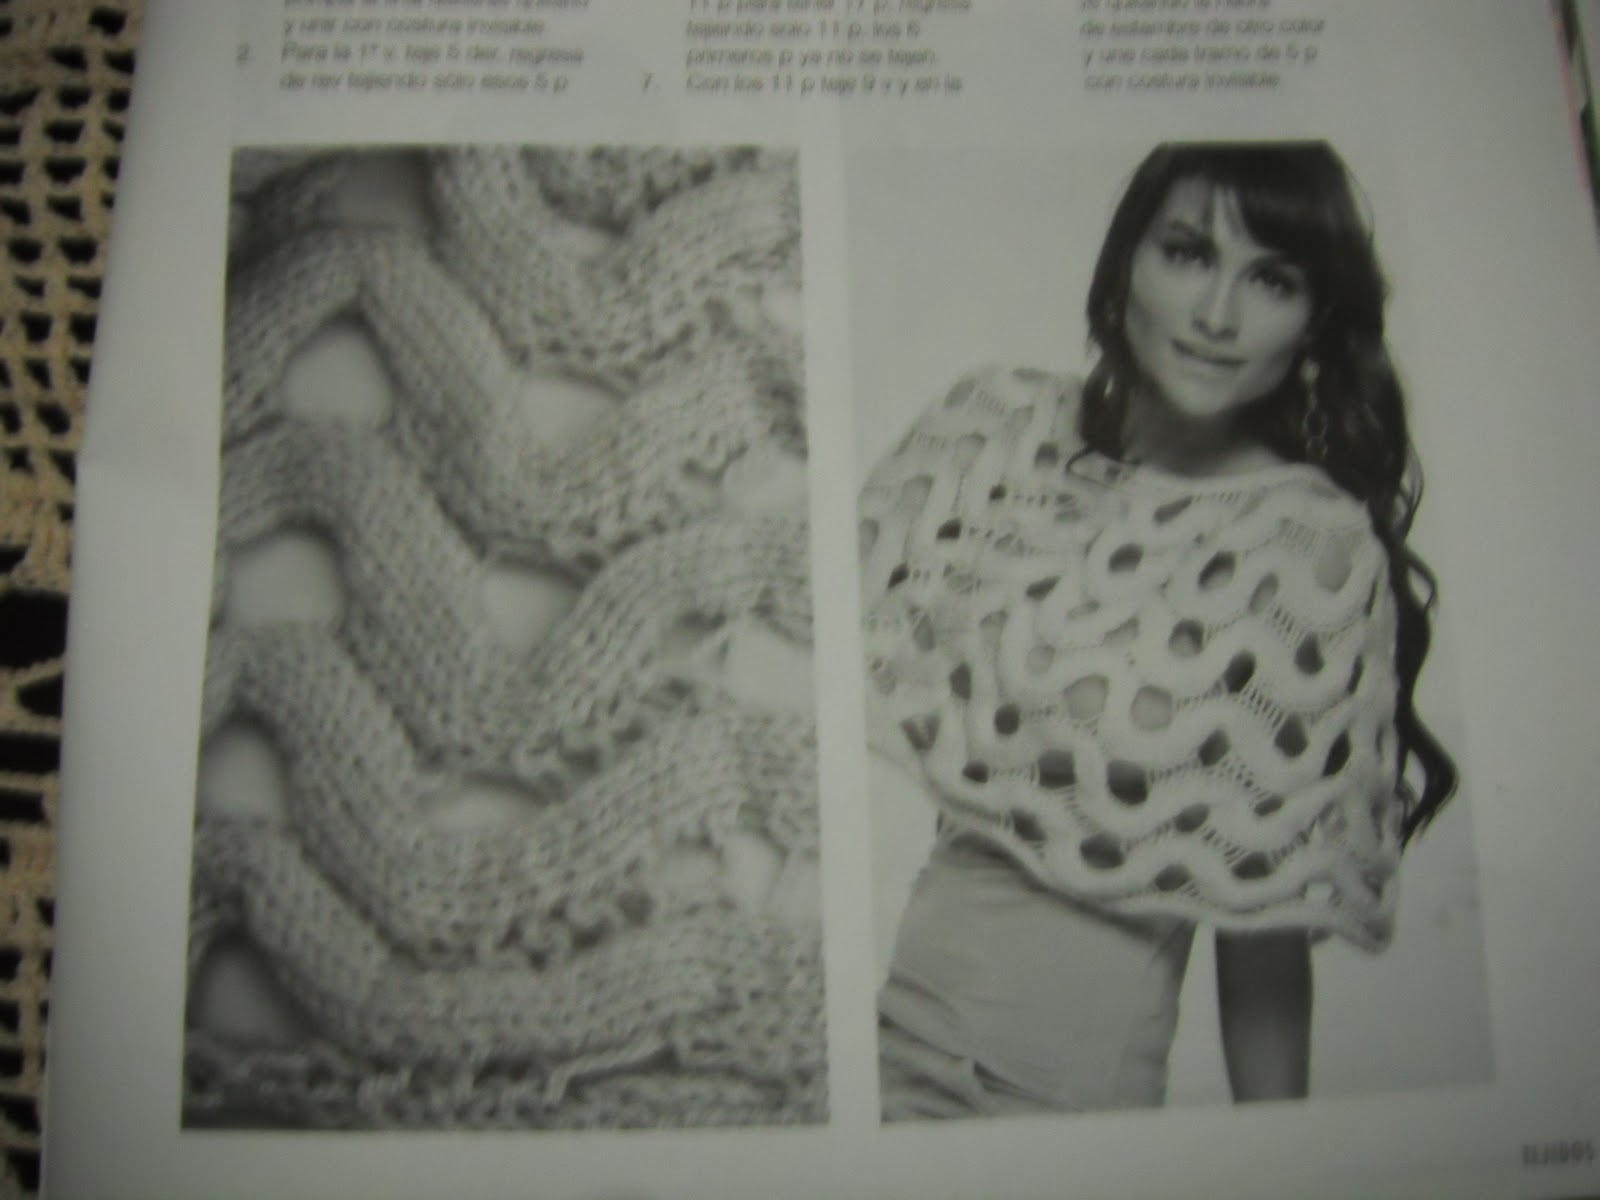 http://2.bp.blogspot.com/-O2Ov7Y0CnOc/ToME_8HBHVI/AAAAAAAASqQ/NNImjljpFUM/s1600/Crochet.%20Knit%20aran.%20026.jpg